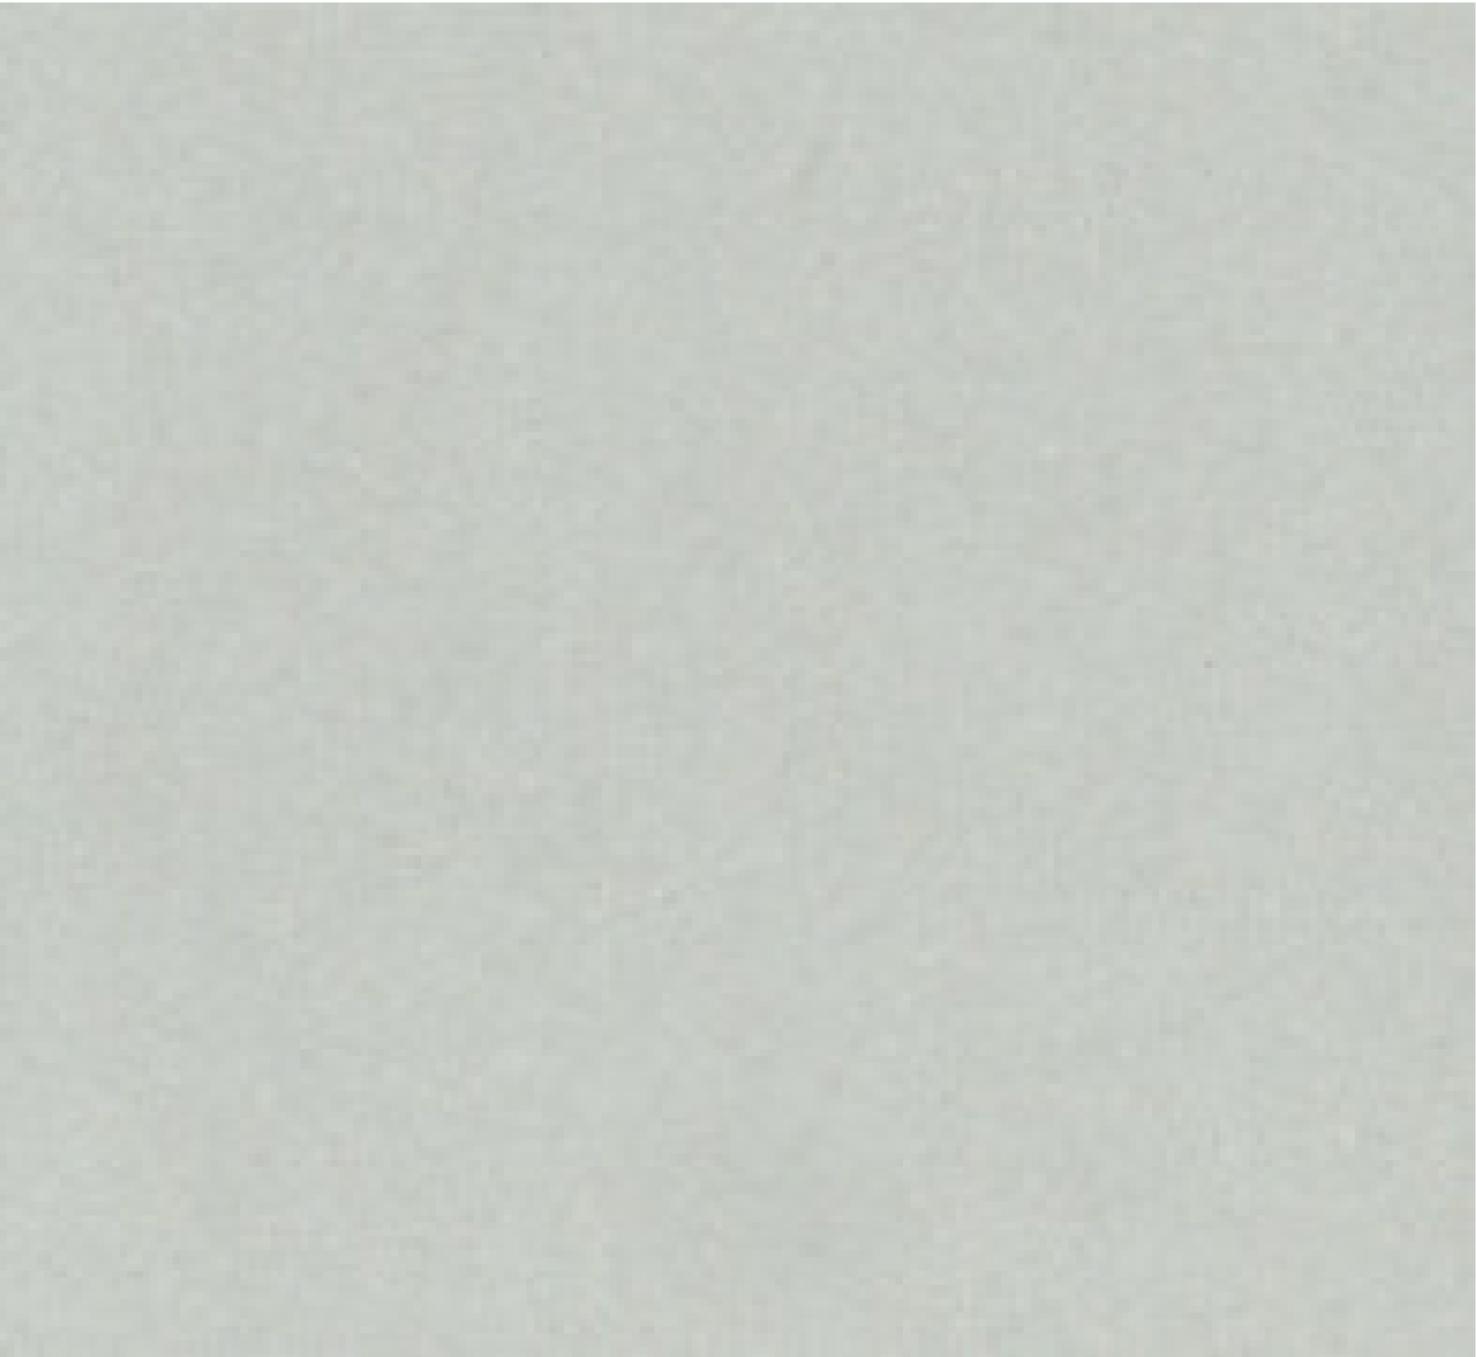 Simplicity Pale Grey 911